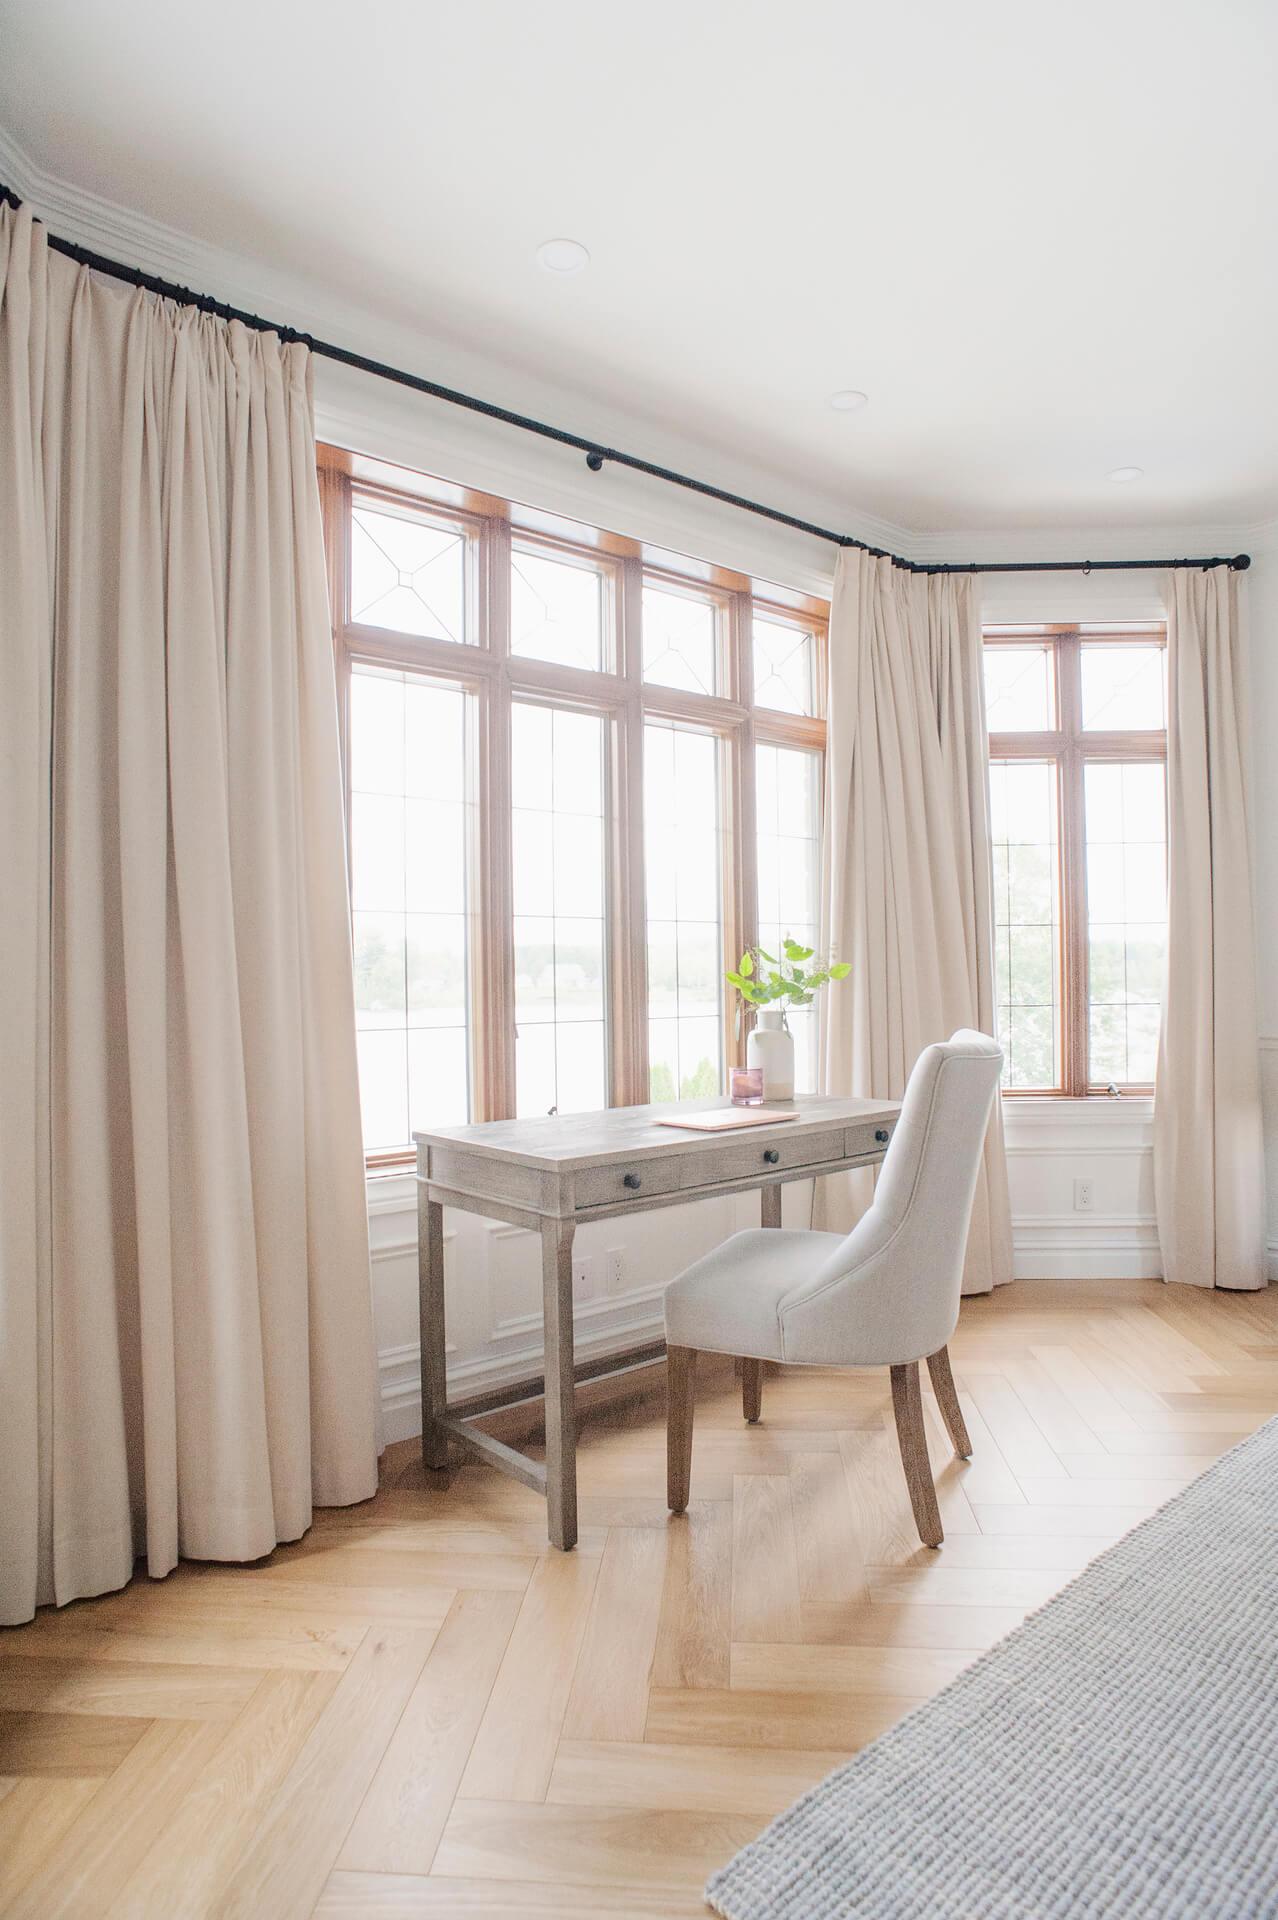 AKB Design chambre des maitres lit baldaquin plancher chene blanc herringbone 2